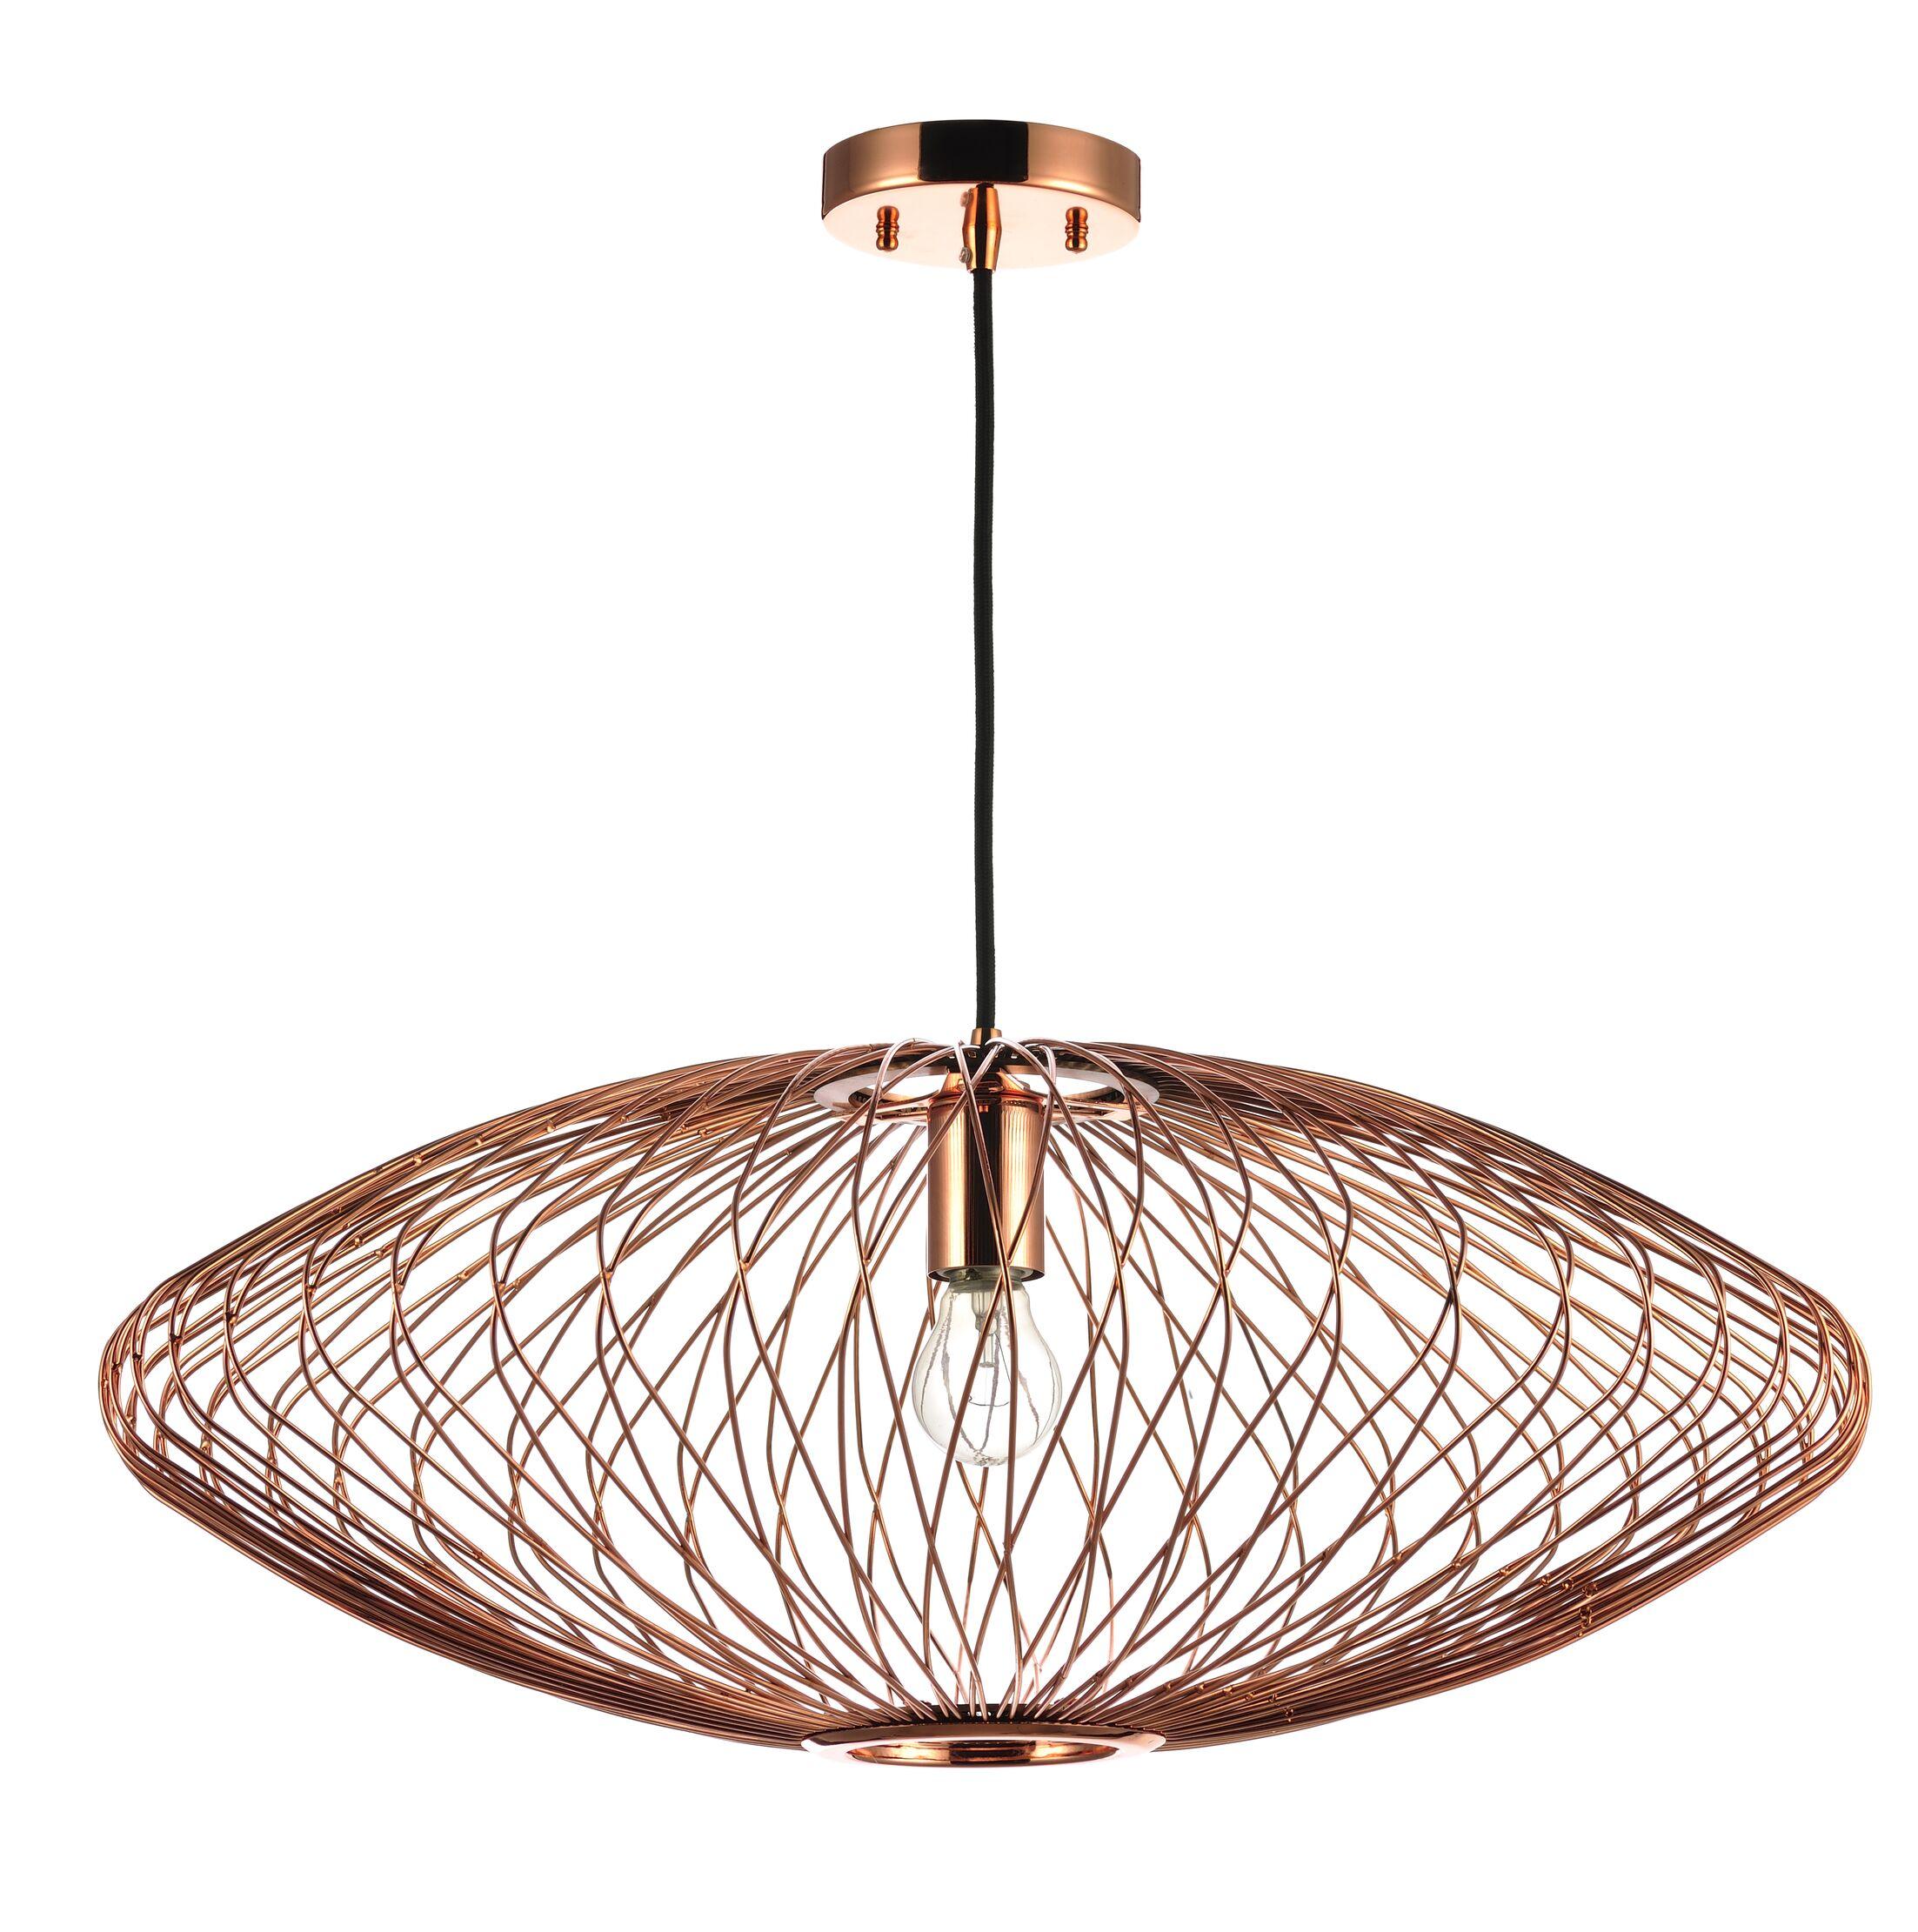 Rumfelt 1-Light Mini Pendant Lamp Color: Copper